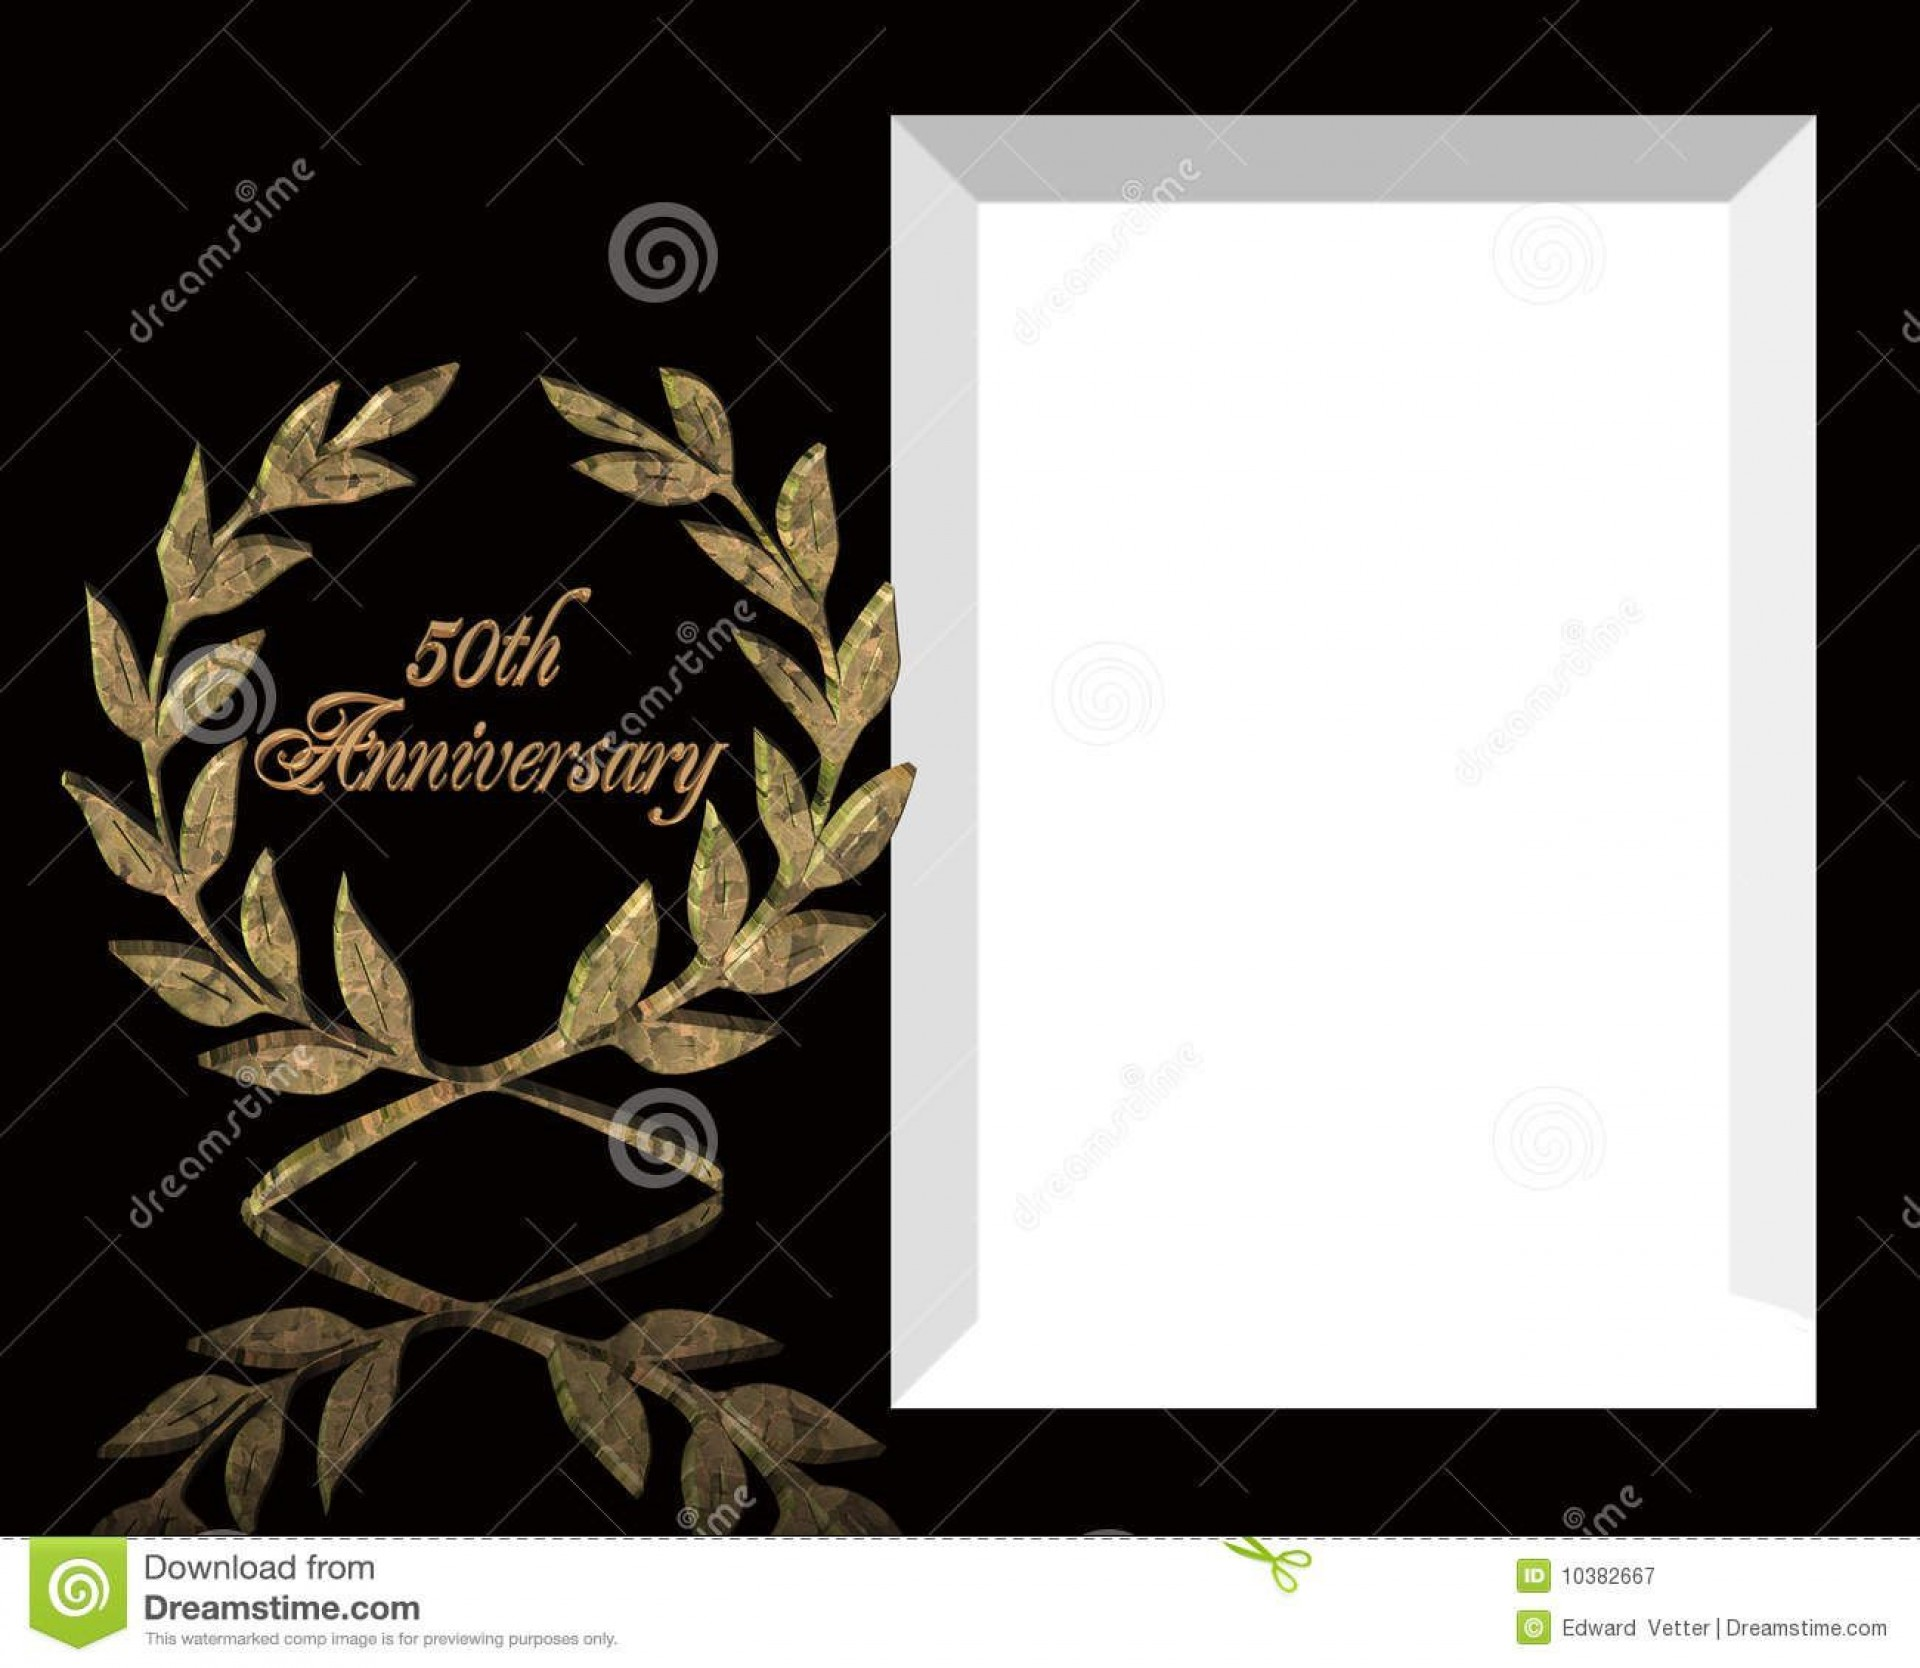 004 Unique 50th Wedding Anniversary Invitation Template Free Download Highest Clarity  Golden1920